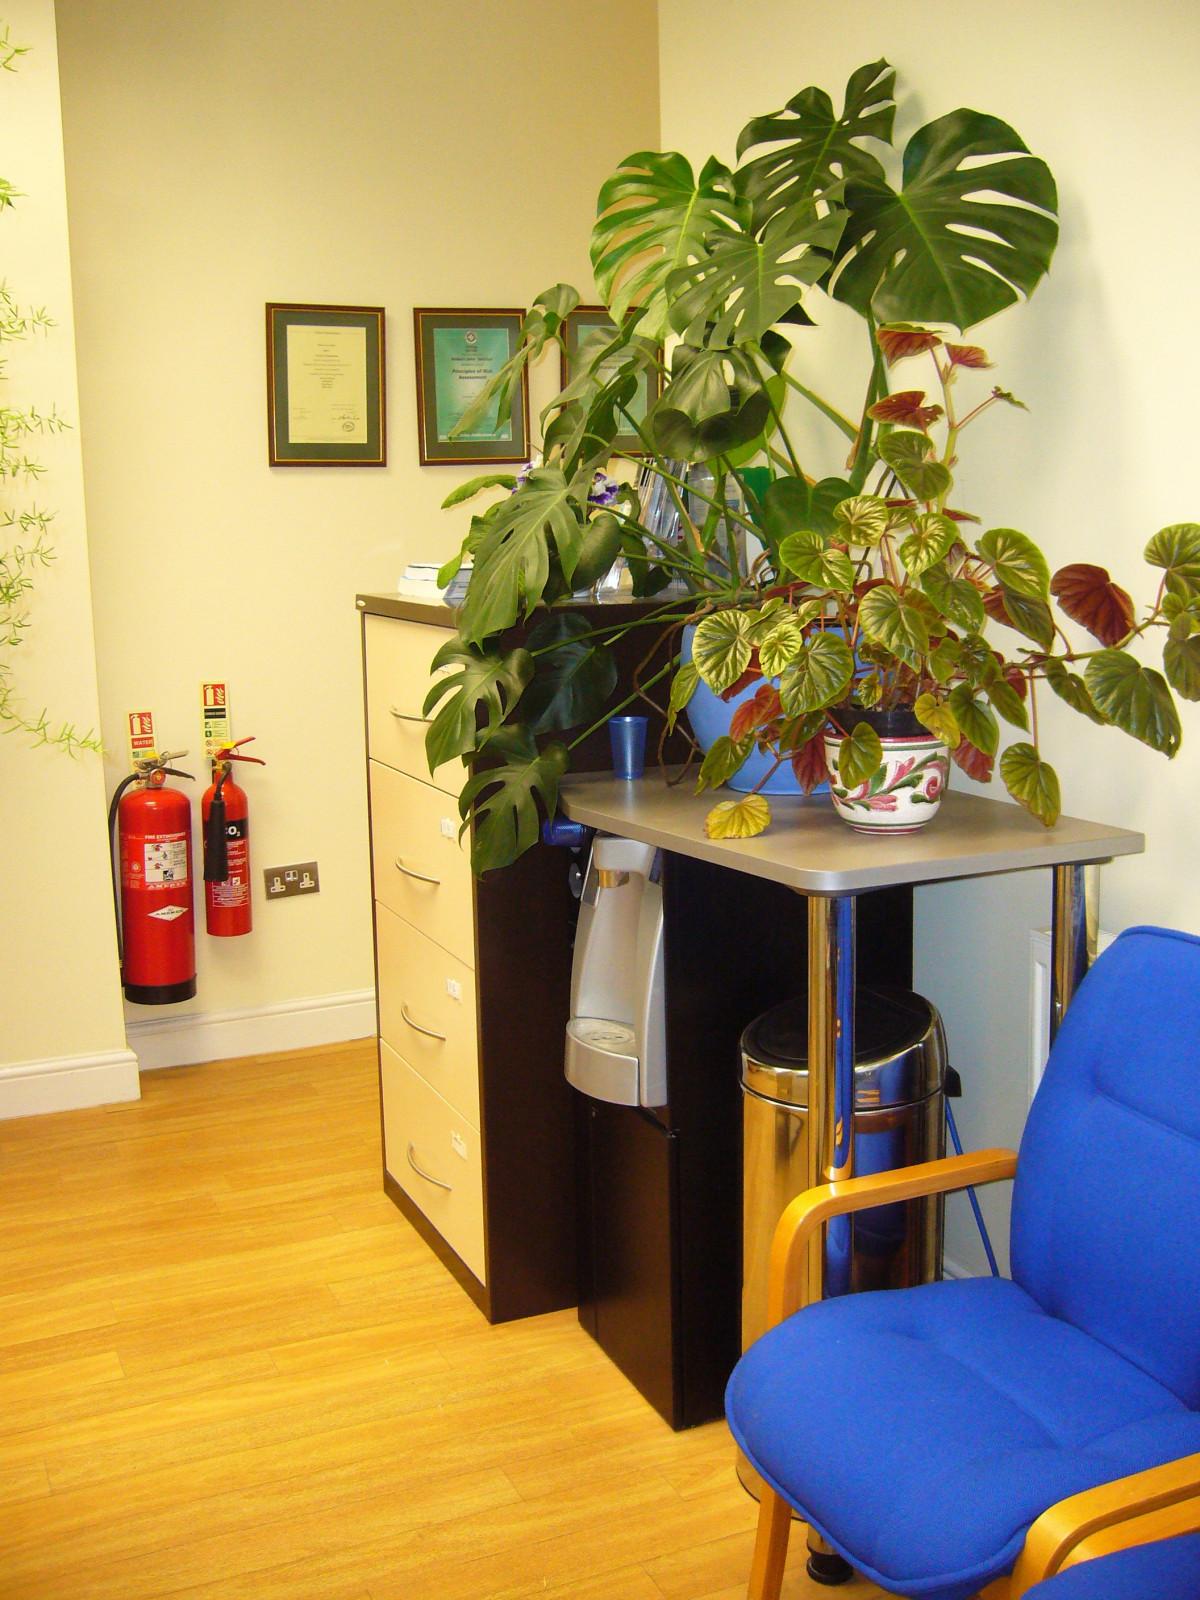 Free Room Design: Free Images : Home, Living Room, Furniture, Interior